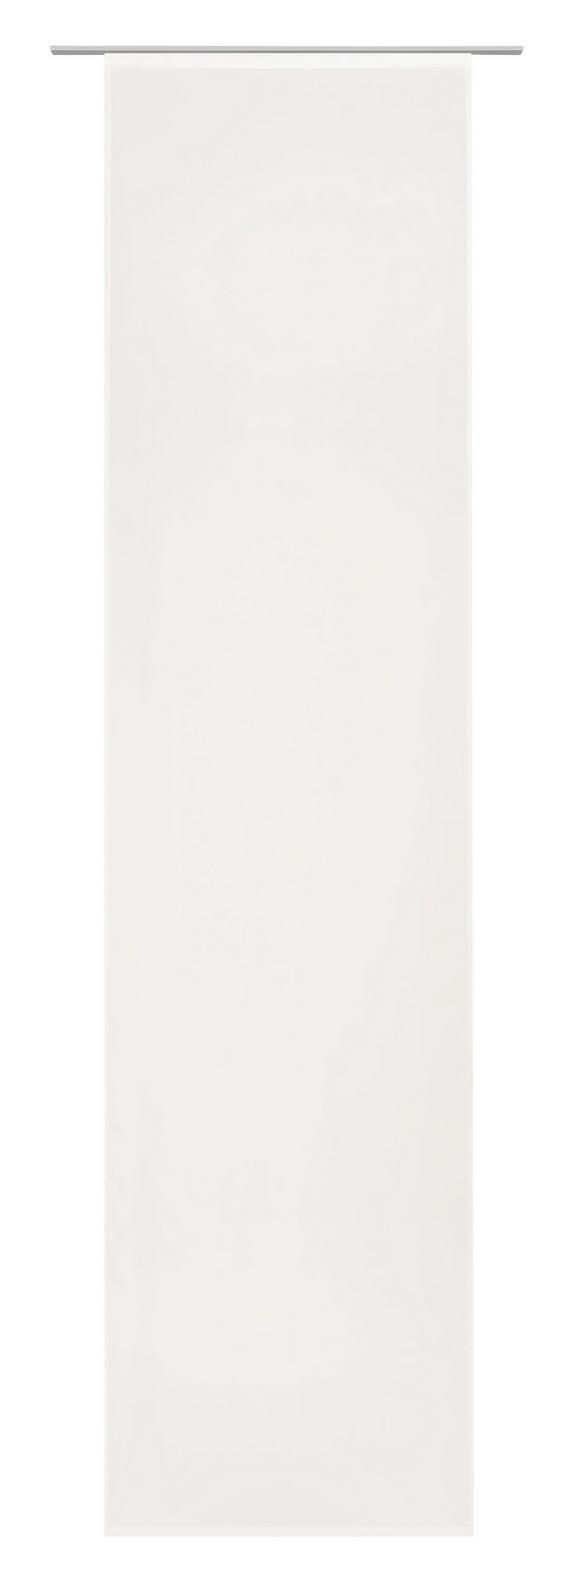 Flächenvorhang Flipp, ca. 60x245cm - Creme, Textil (60/245cm) - BASED